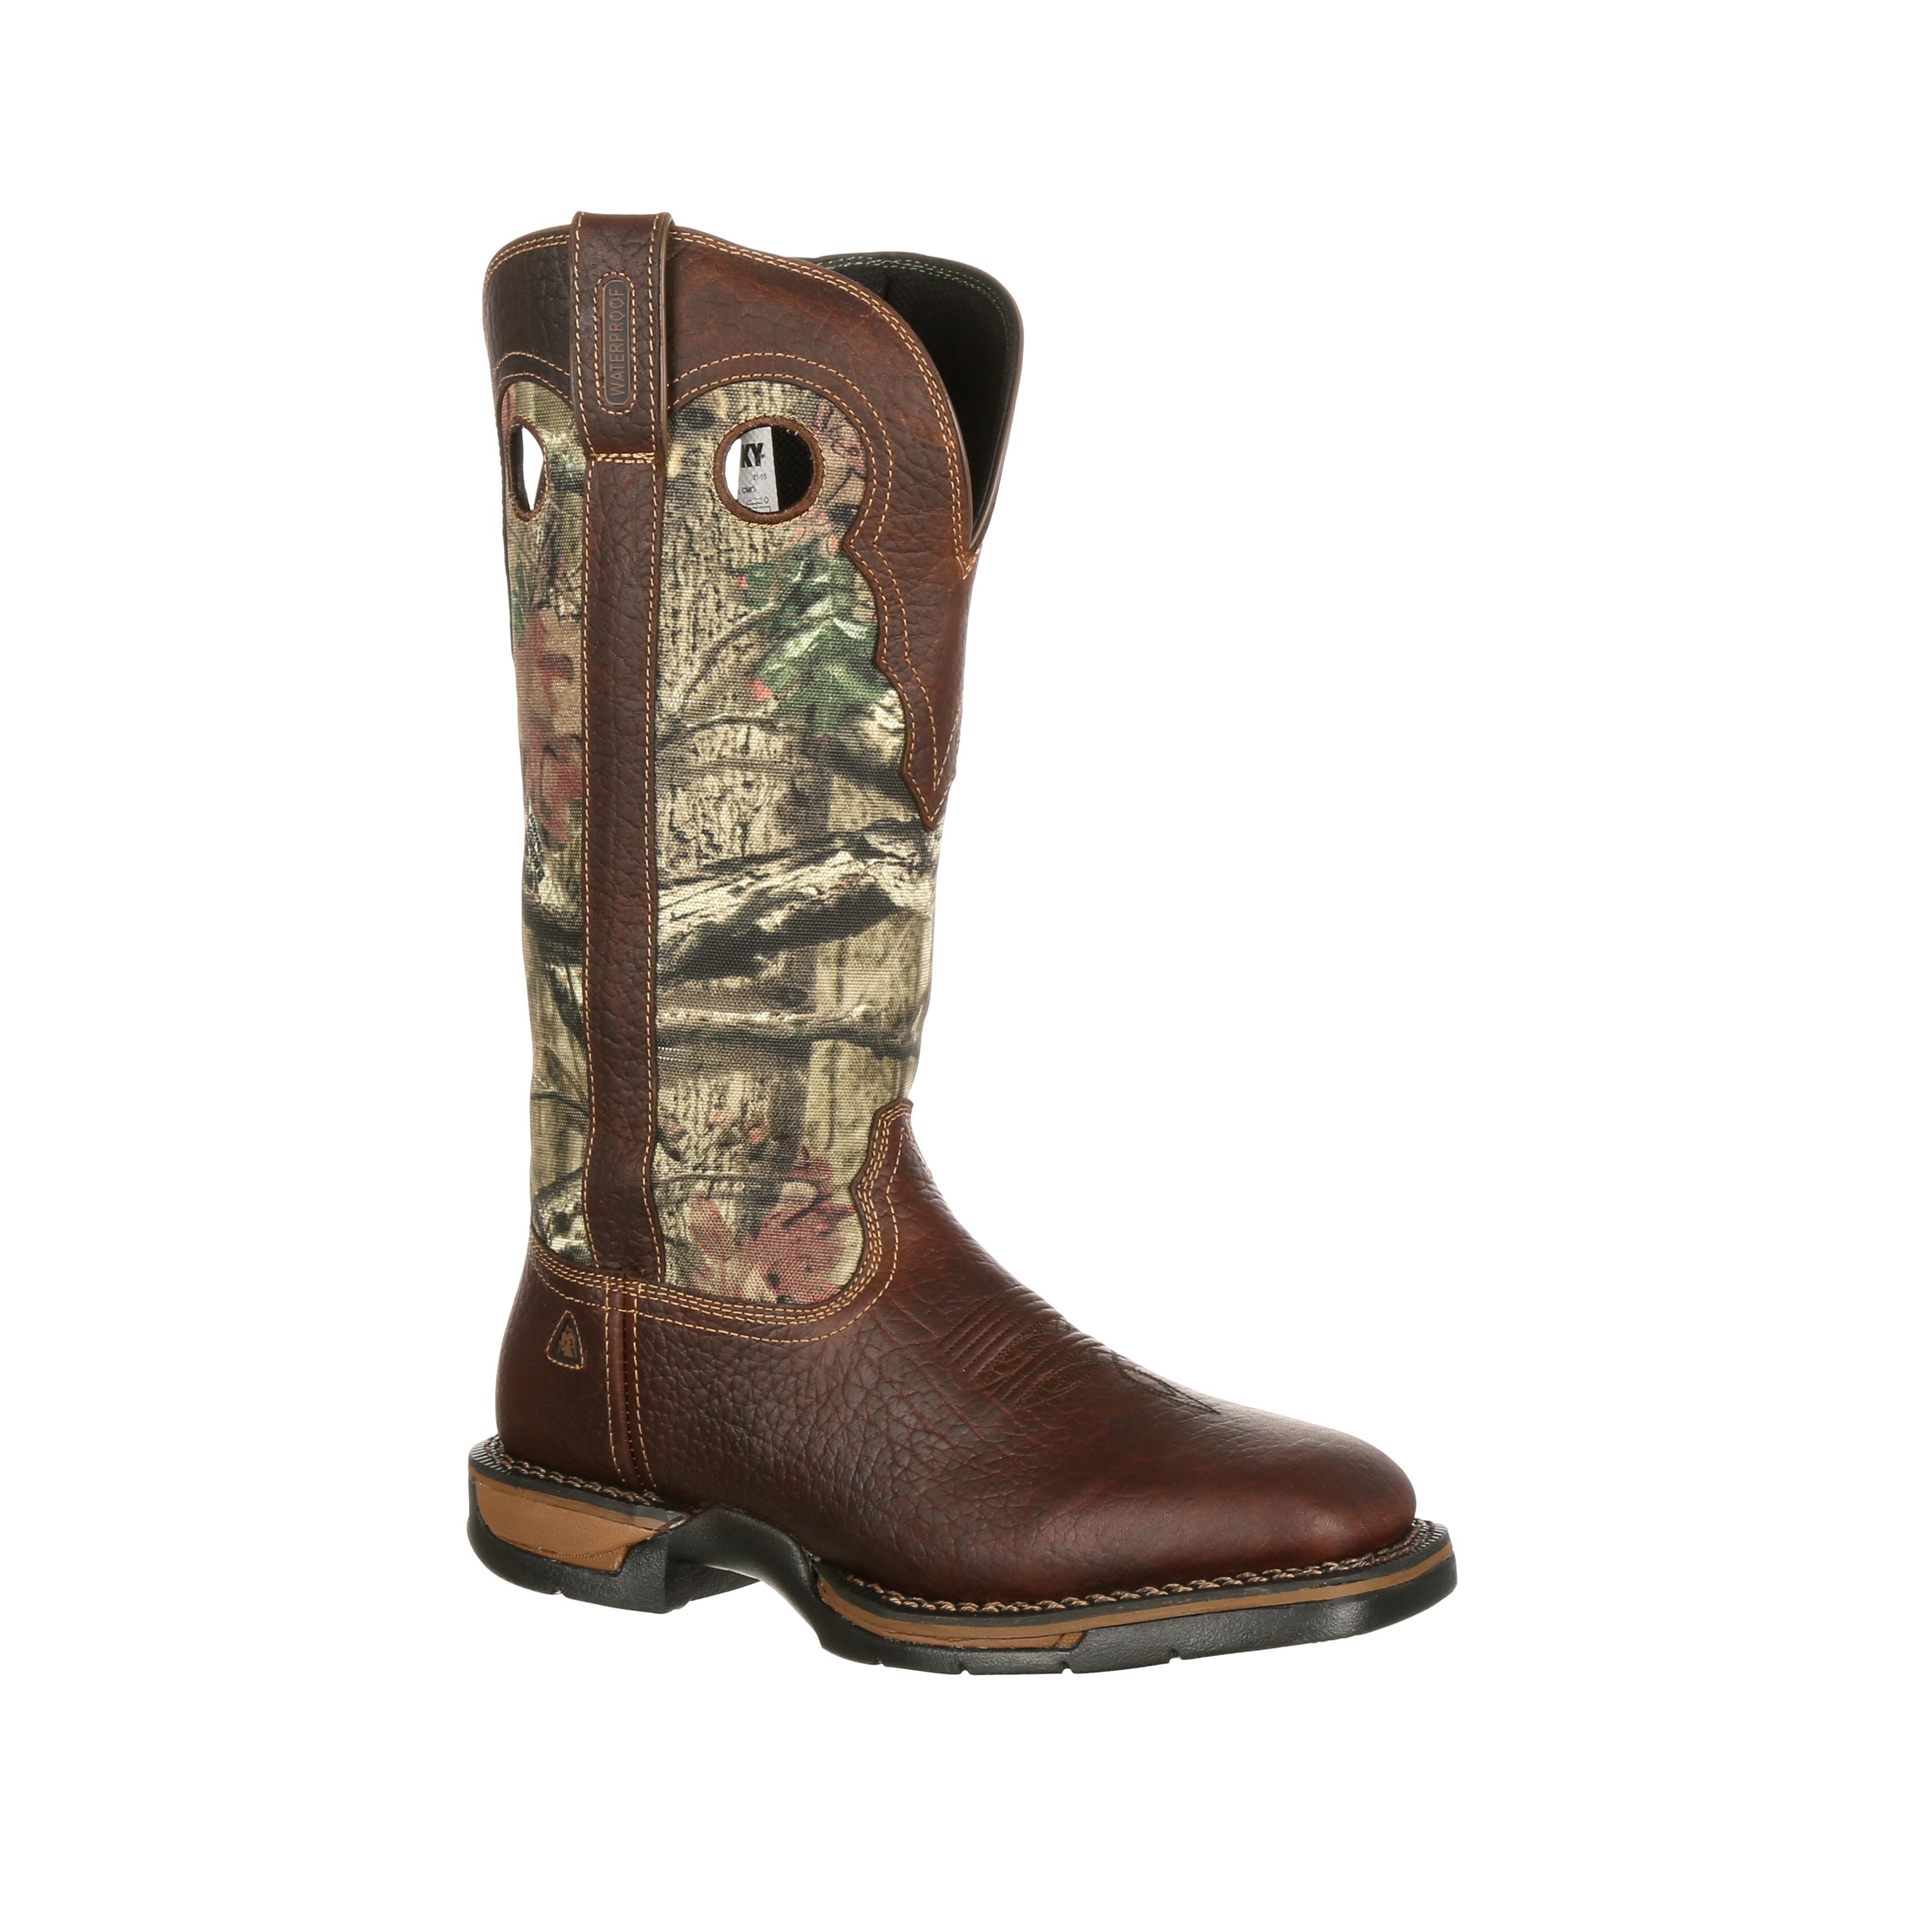 rocky long range waterproof camo snake boots fq0009041. Black Bedroom Furniture Sets. Home Design Ideas